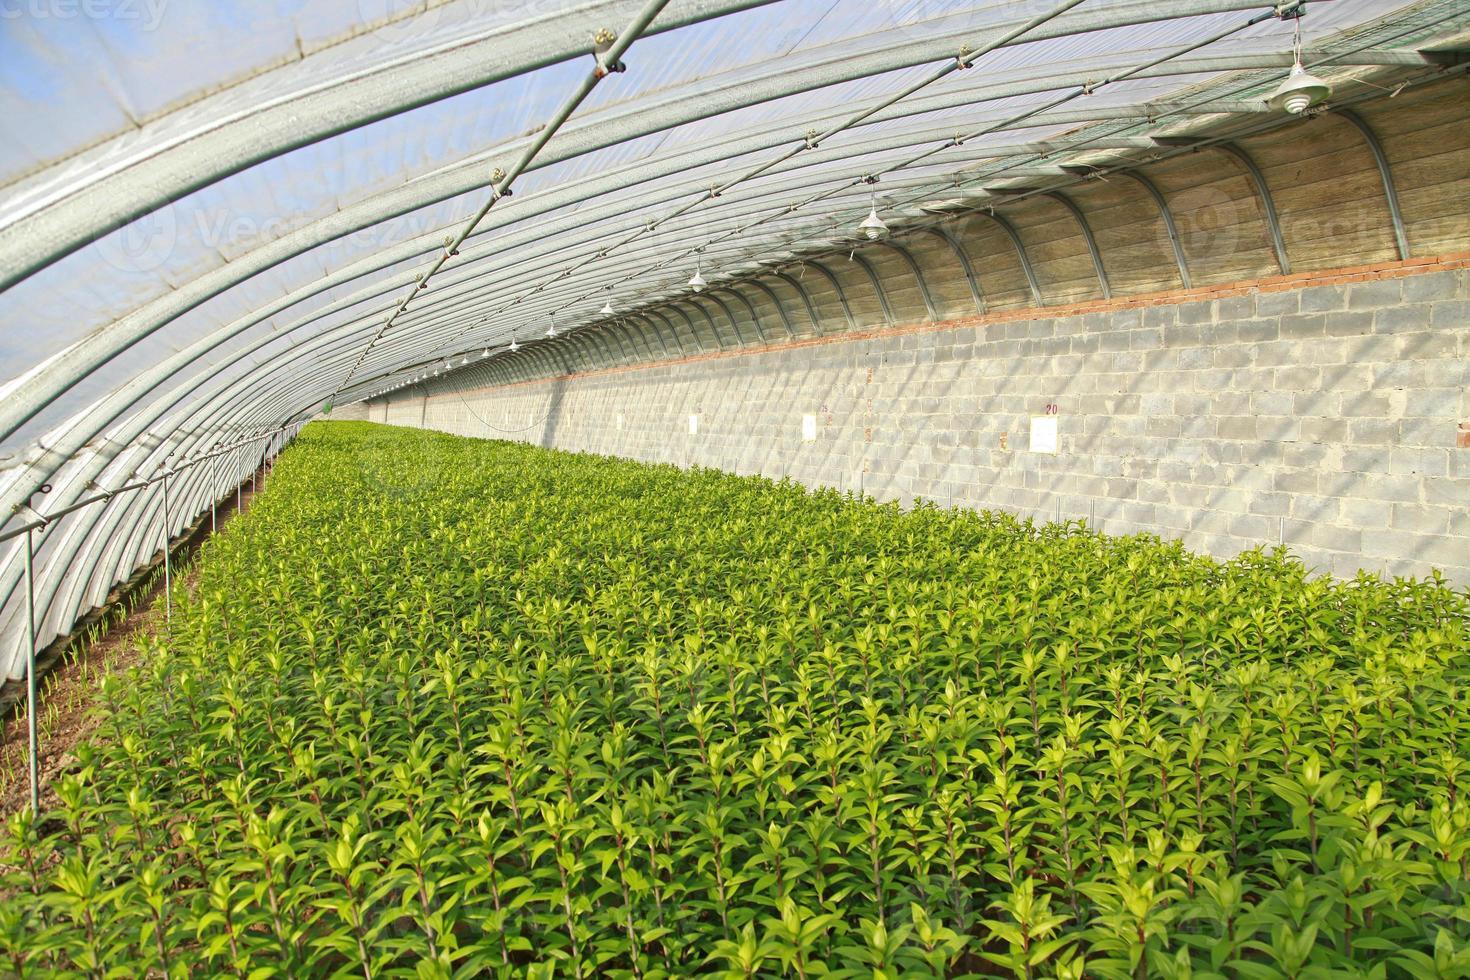 liljor planteras i växthus foto